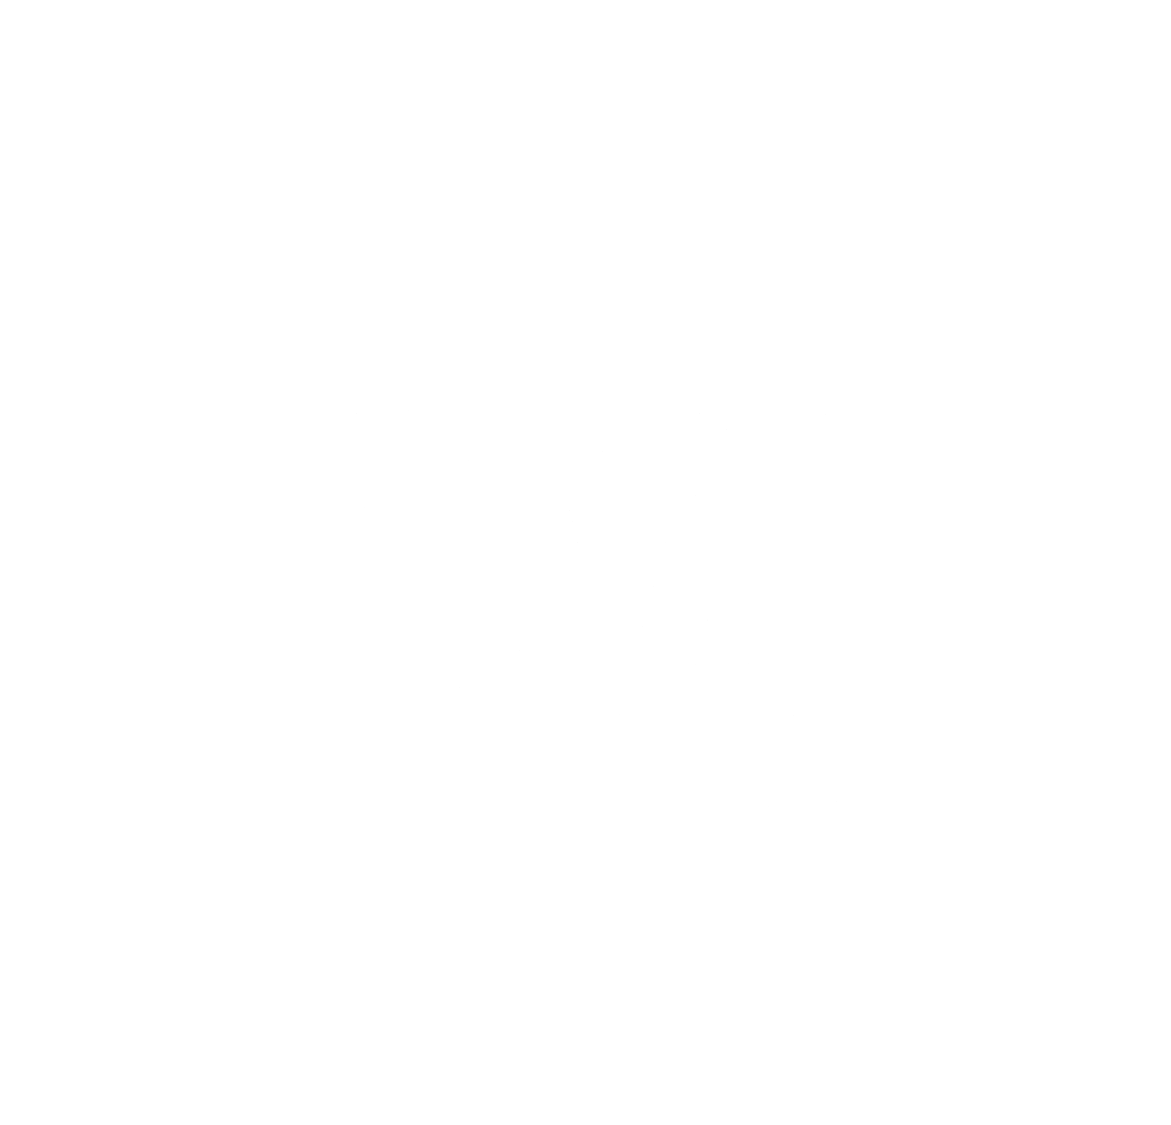 hvg logo